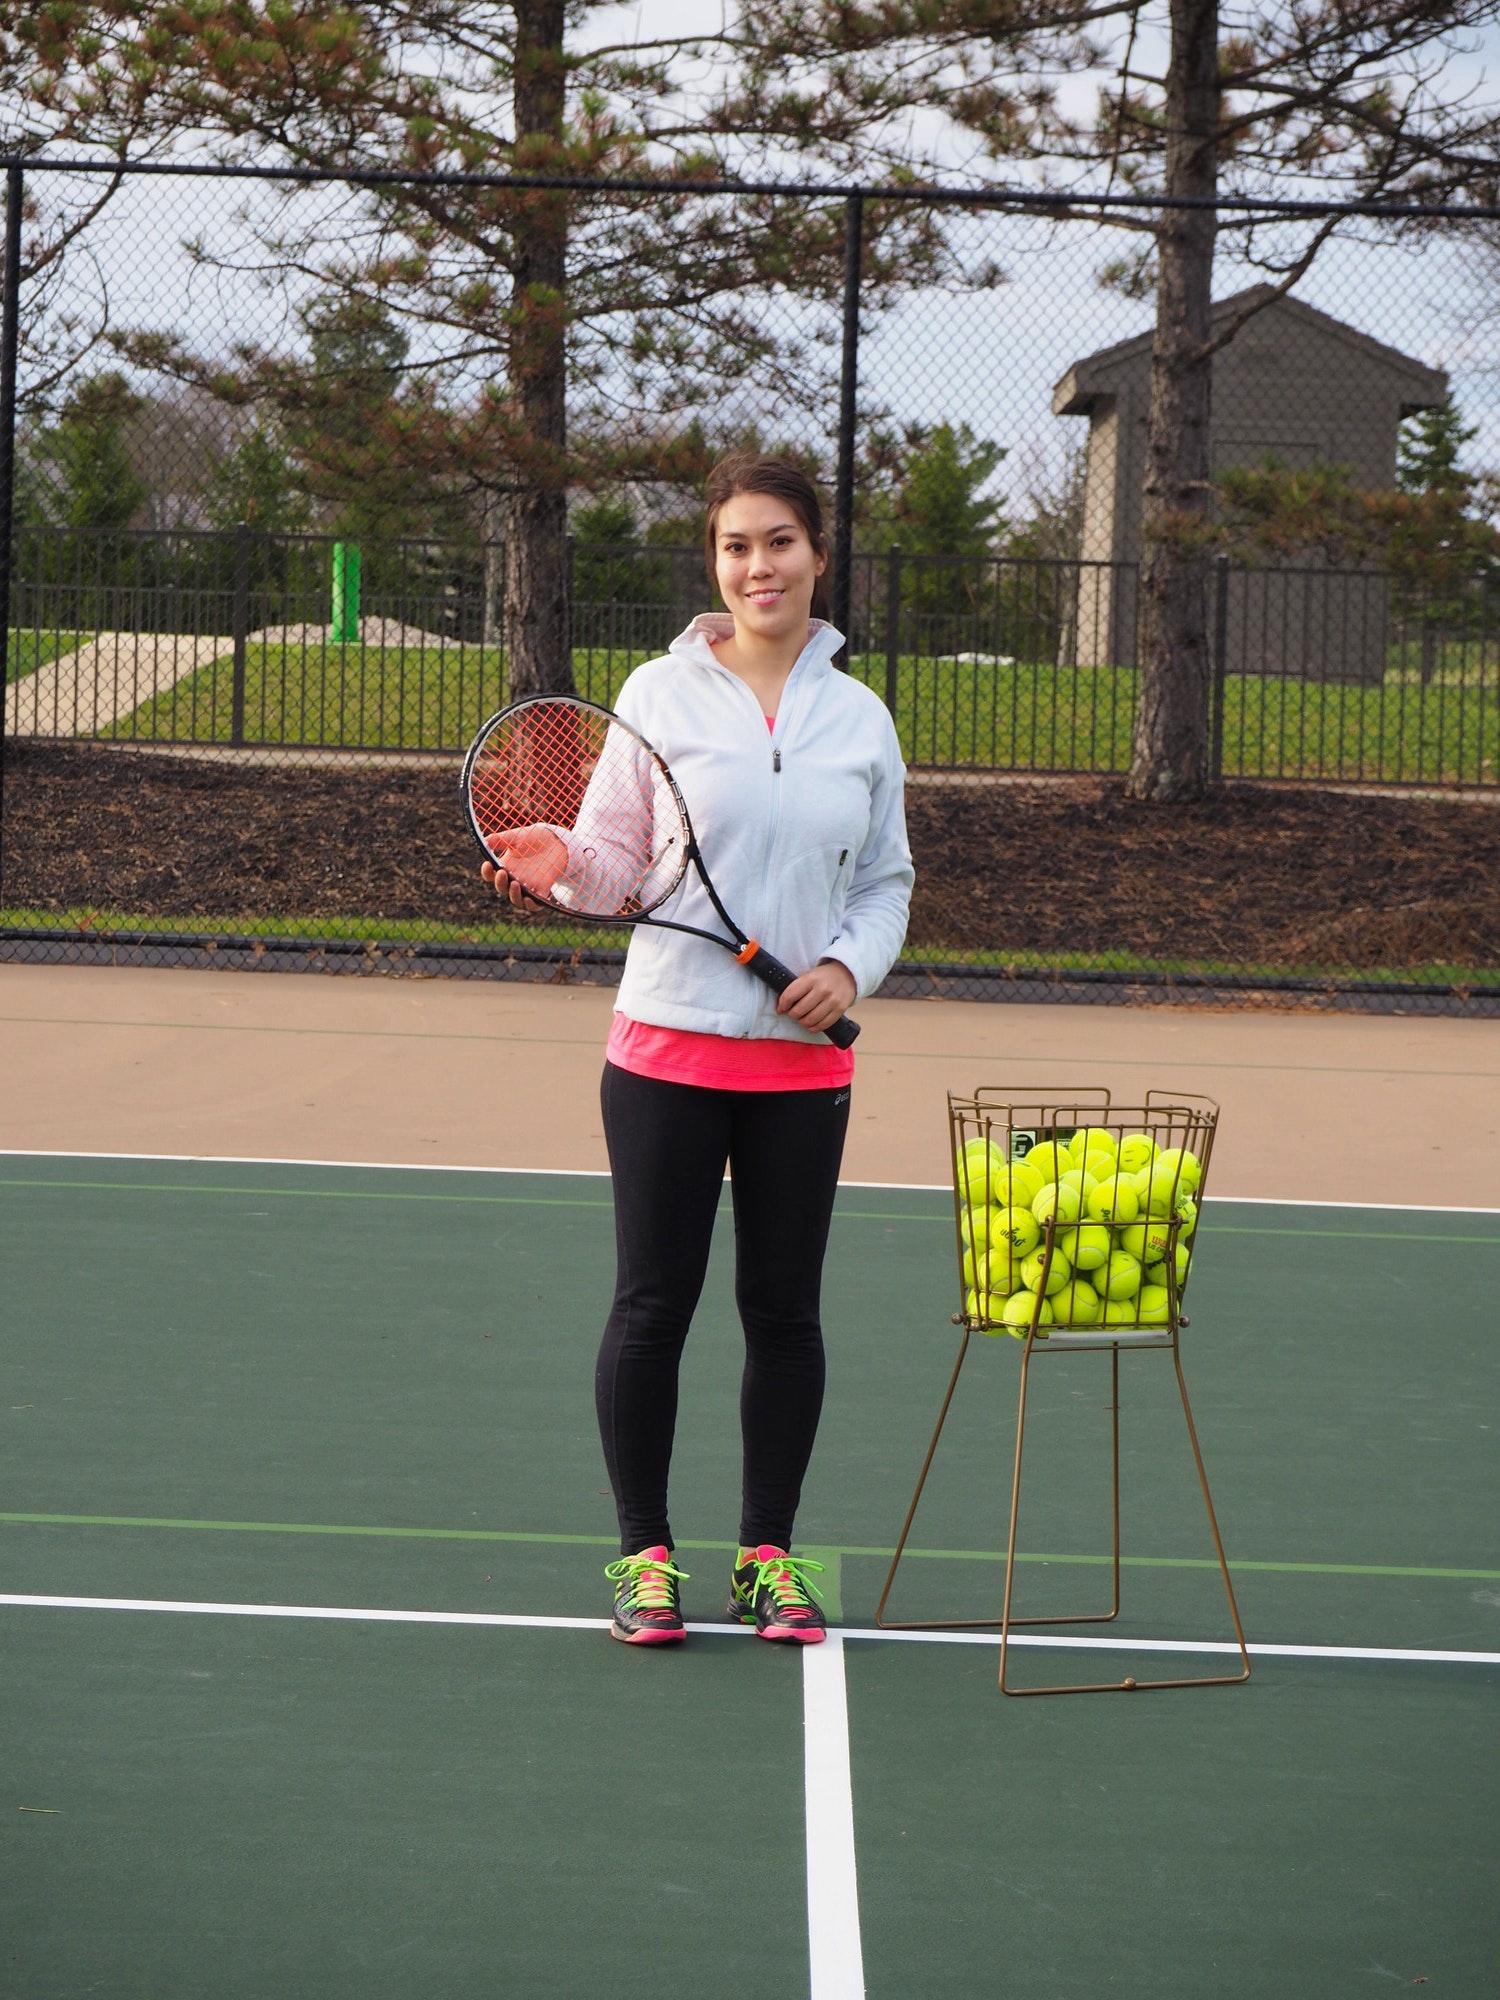 Aileen S. teaches tennis lessons in Dublin, OH